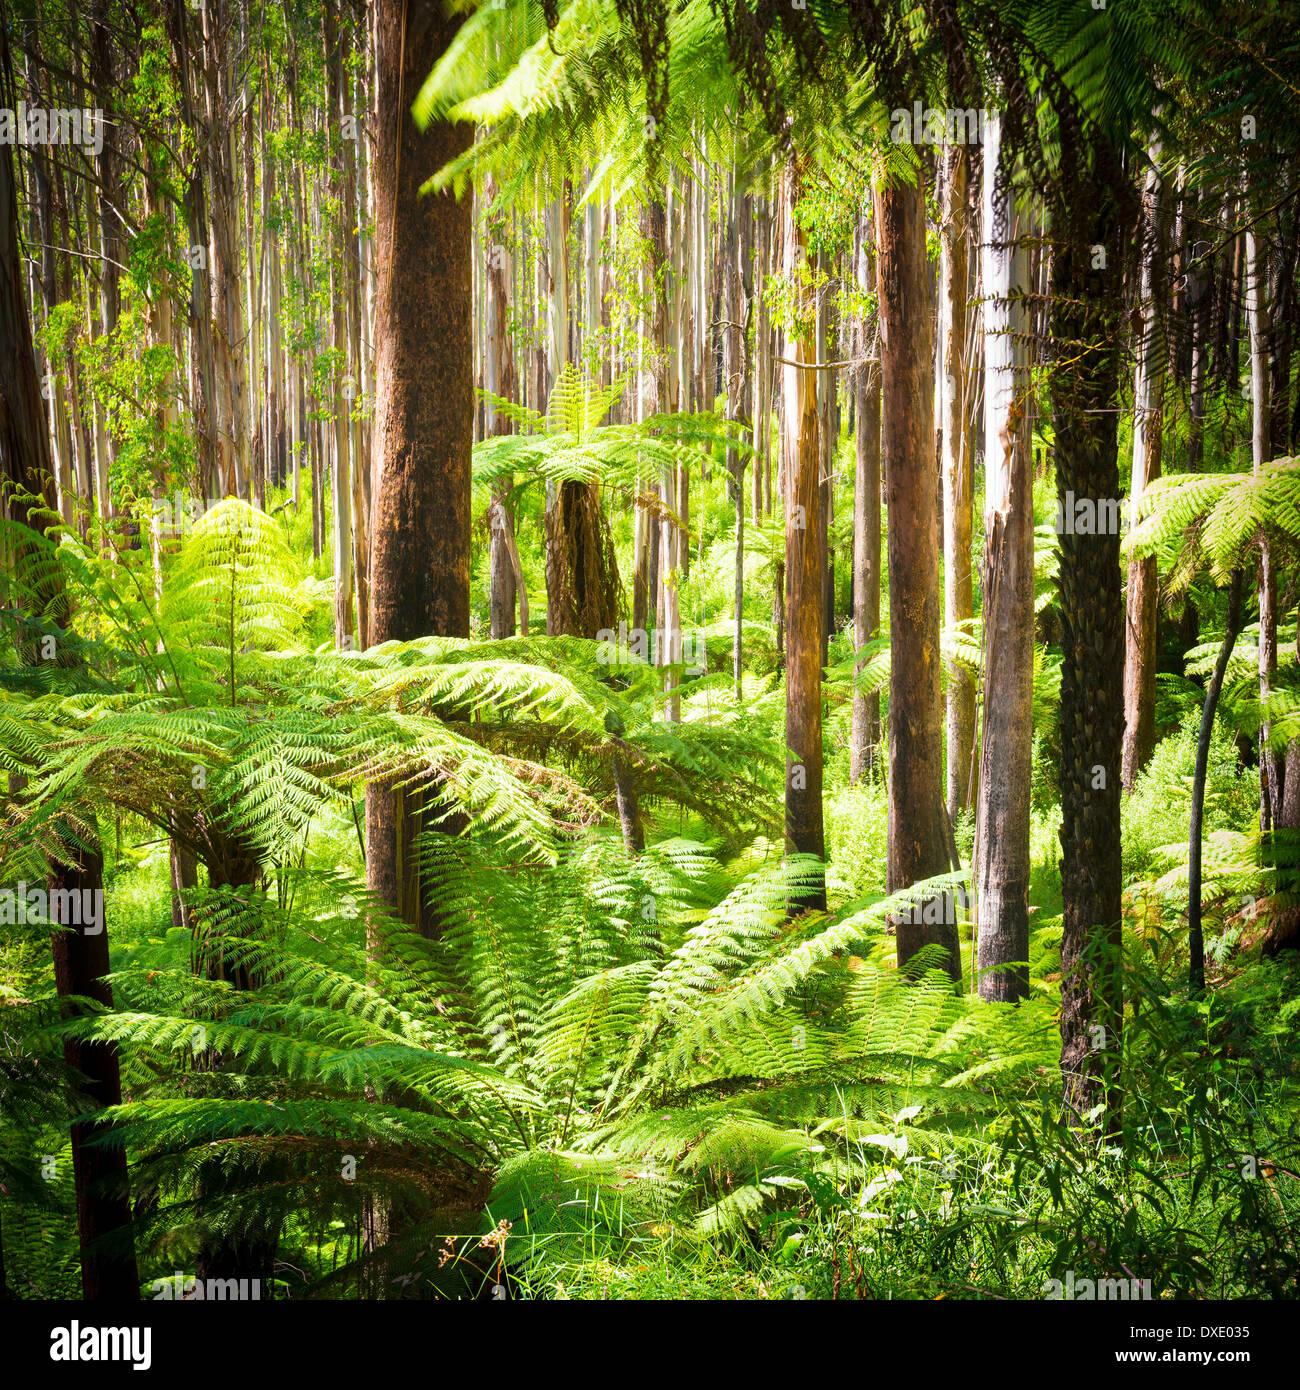 Lussureggianti felci, felci arboree e torreggiante montagna lungo lo sperone nero, Victoria, Australia Immagini Stock